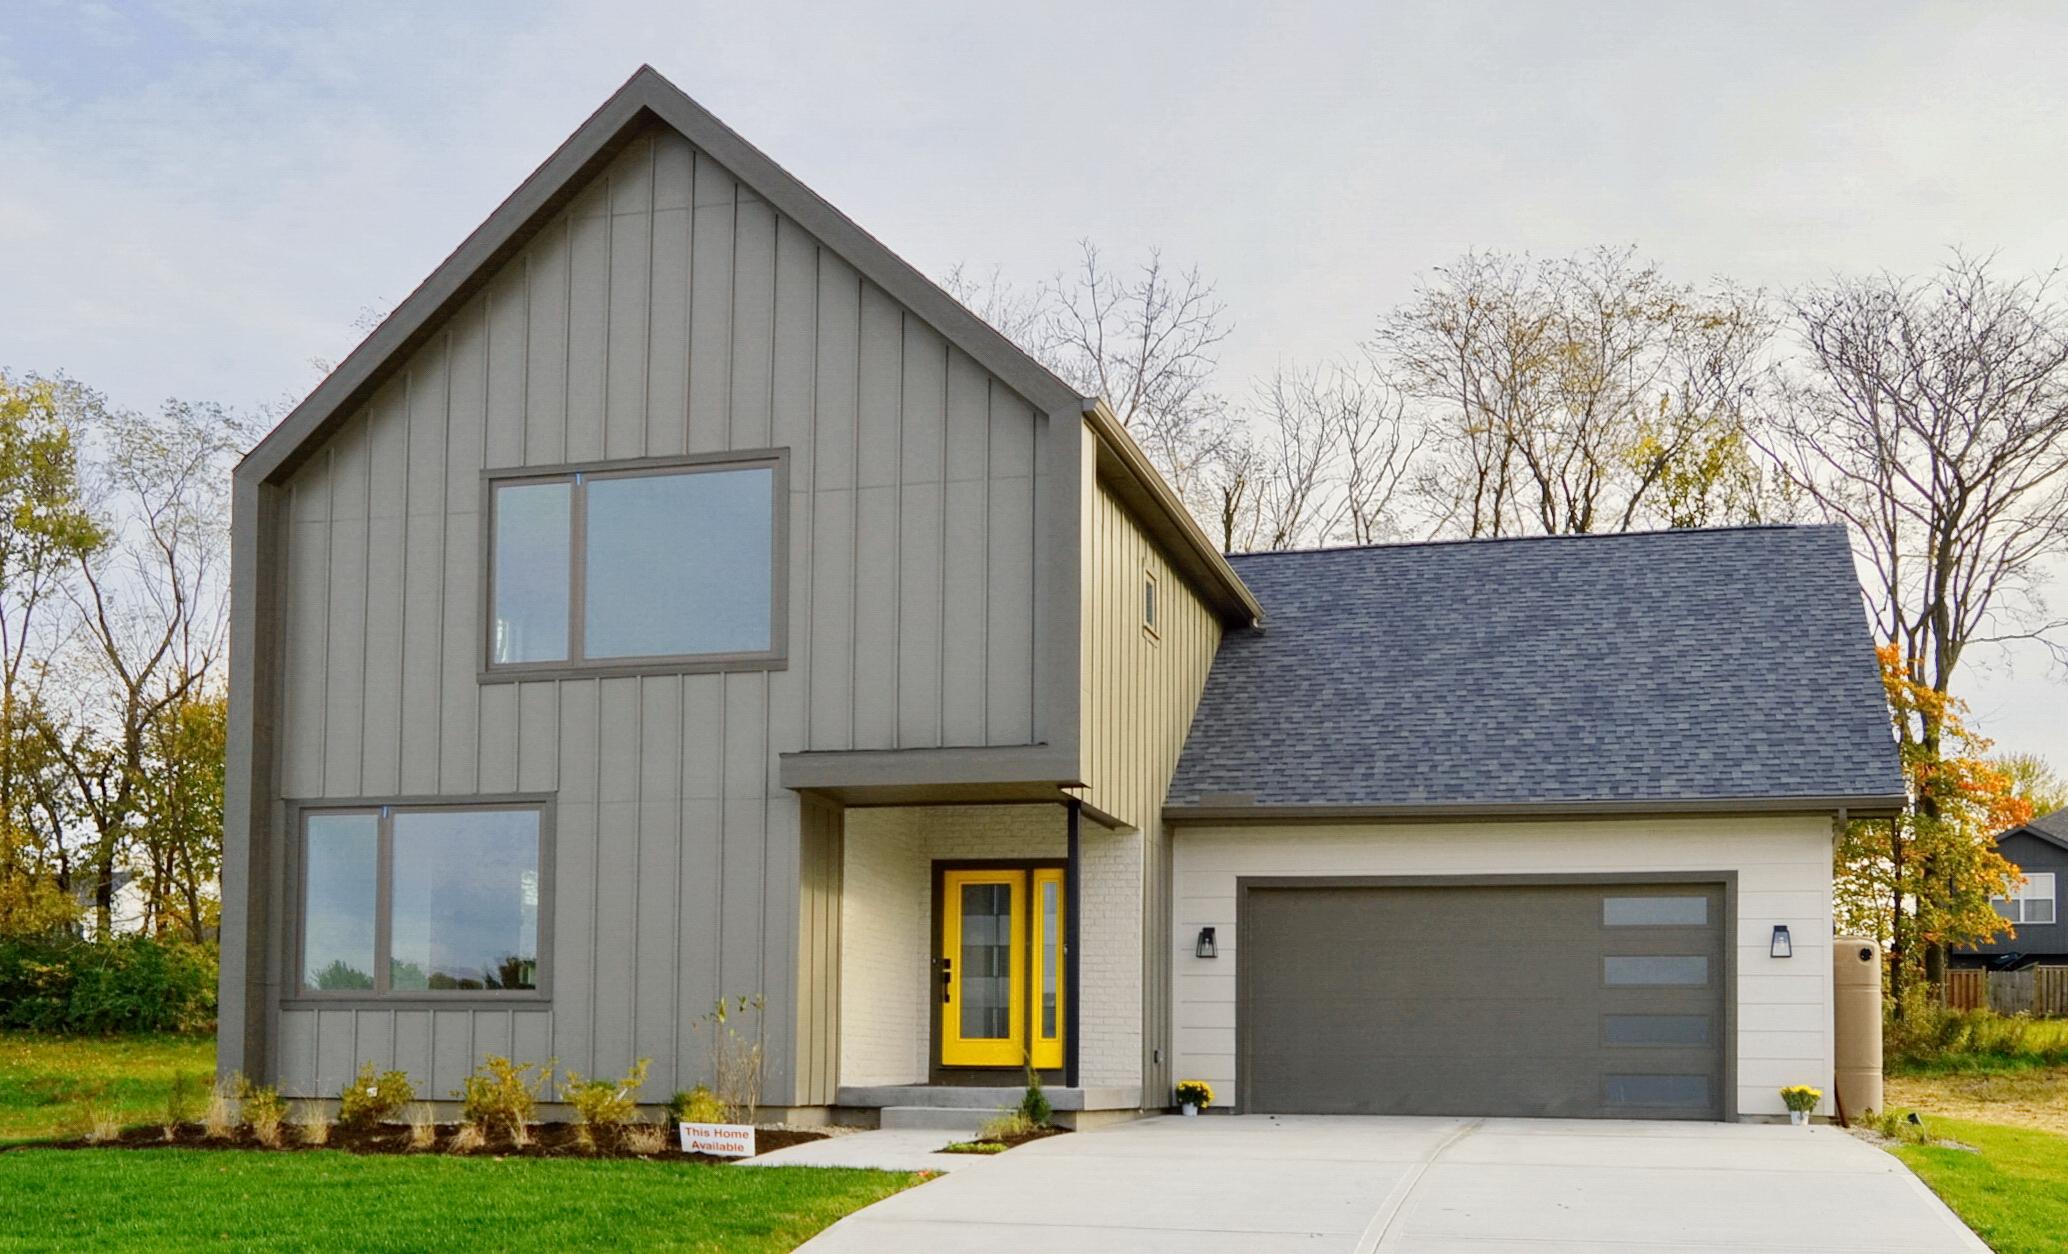 Lot 23 - Urban North, House Plan 1, Elevation A